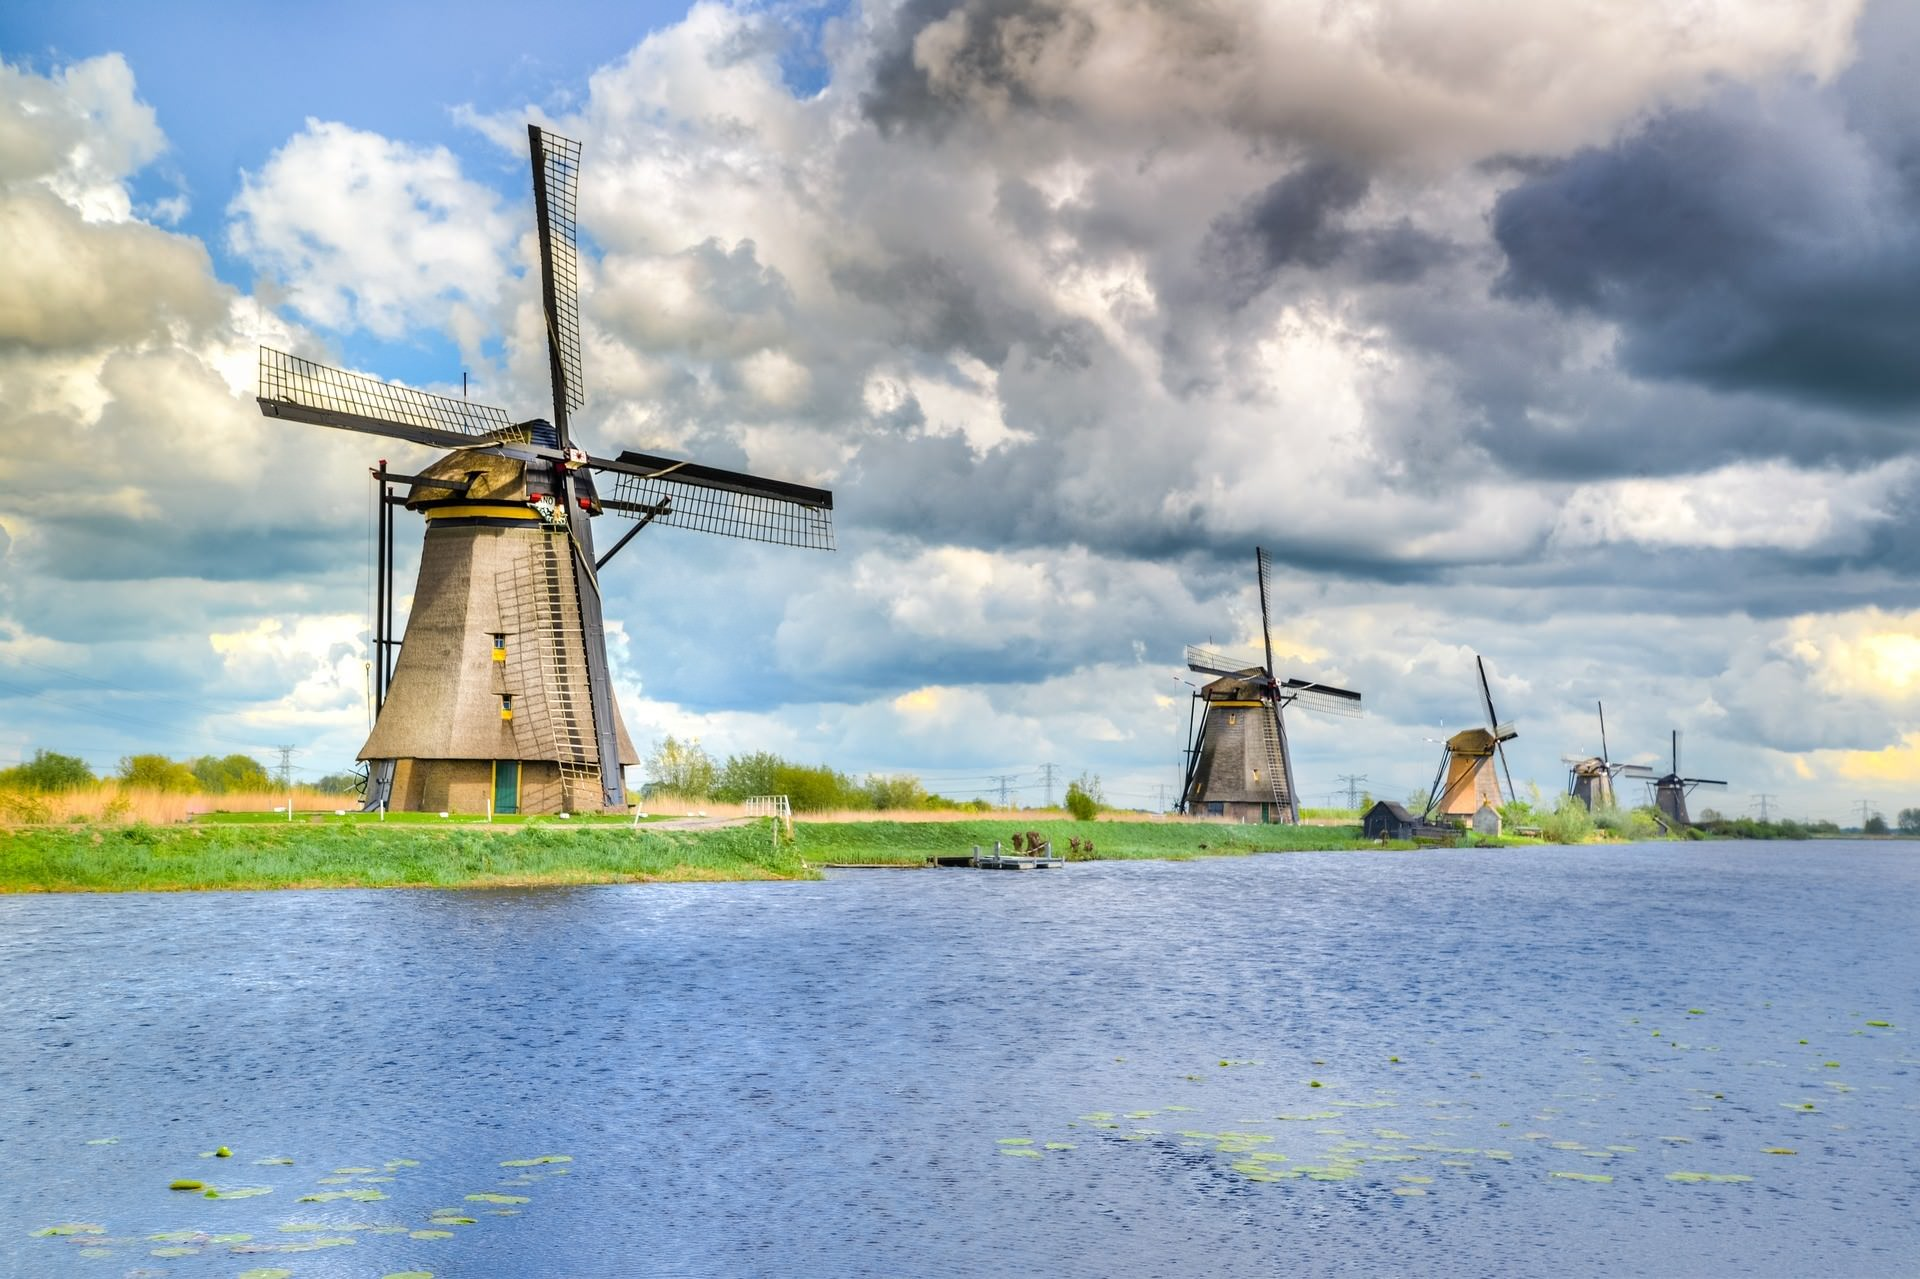 Windmills in Kinderdiik, The Netherlands